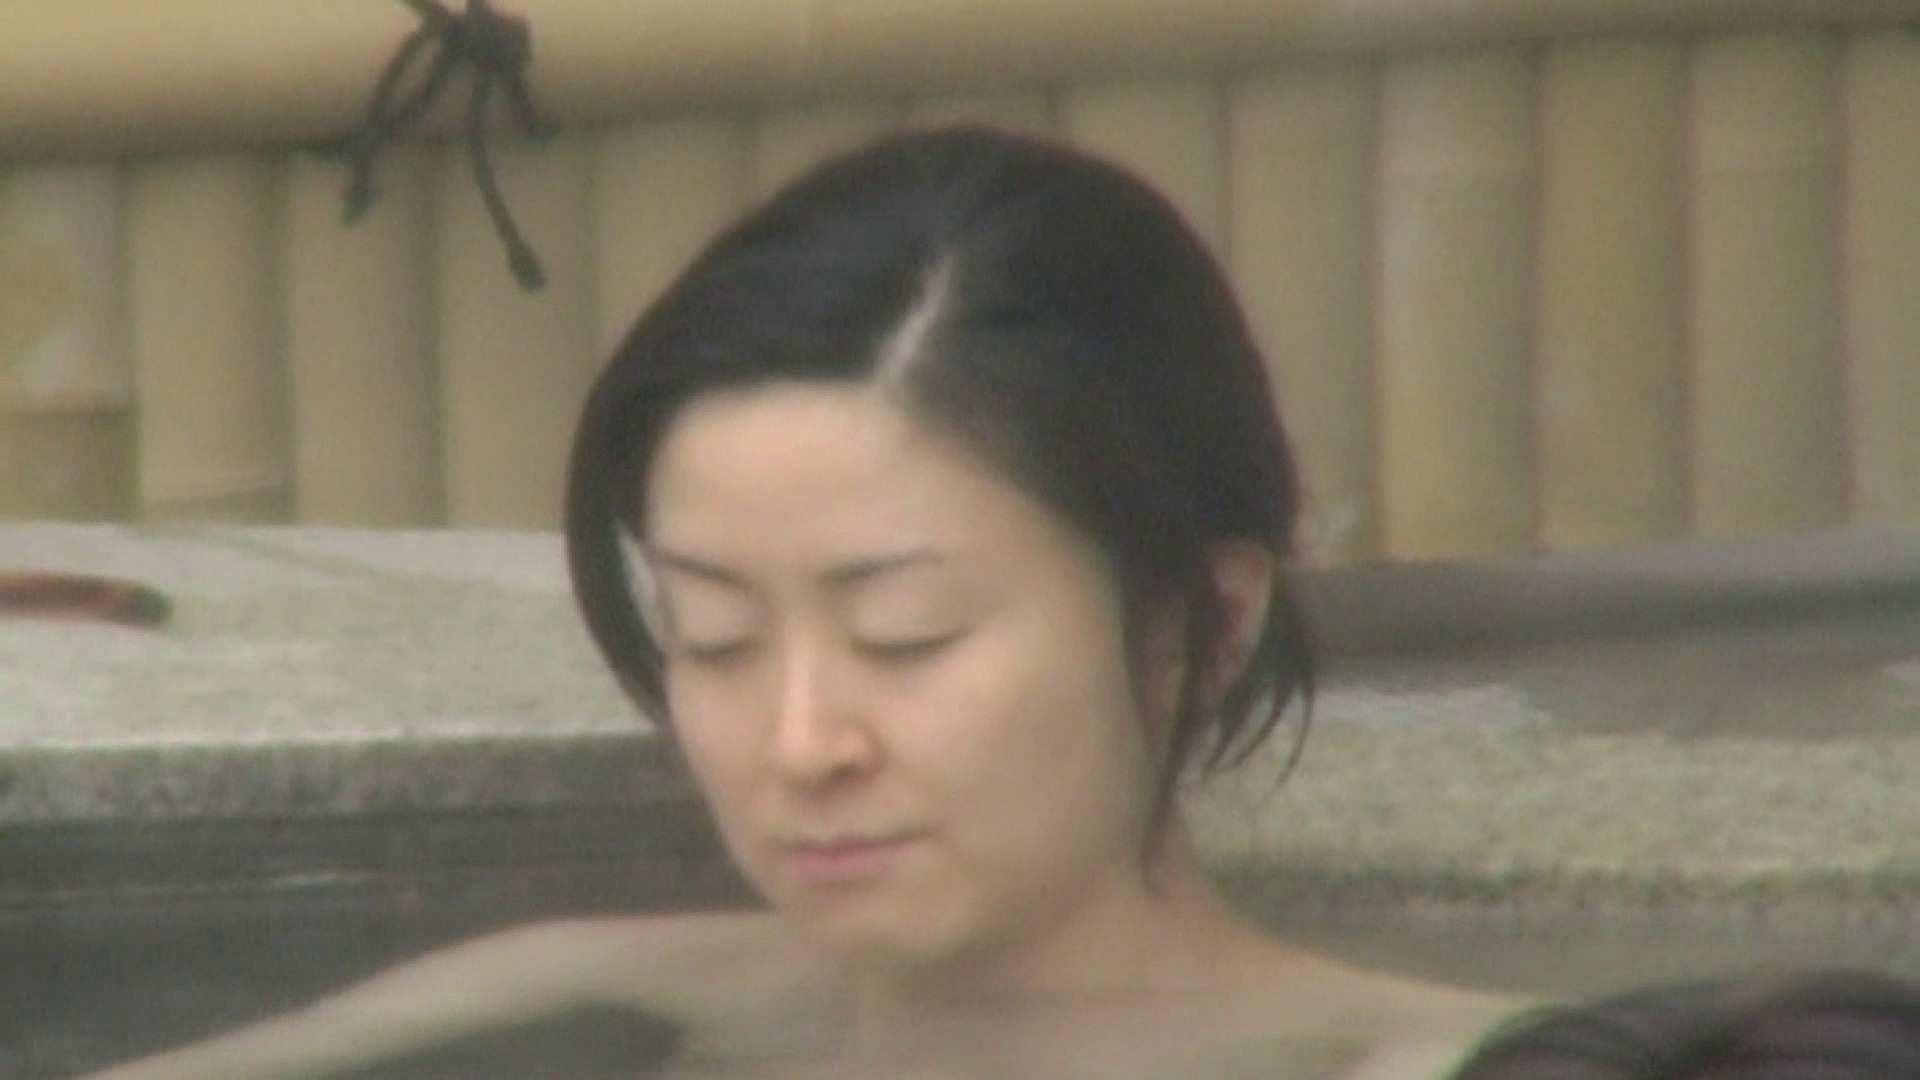 Aquaな露天風呂Vol.548 OLセックス のぞきエロ無料画像 103画像 35